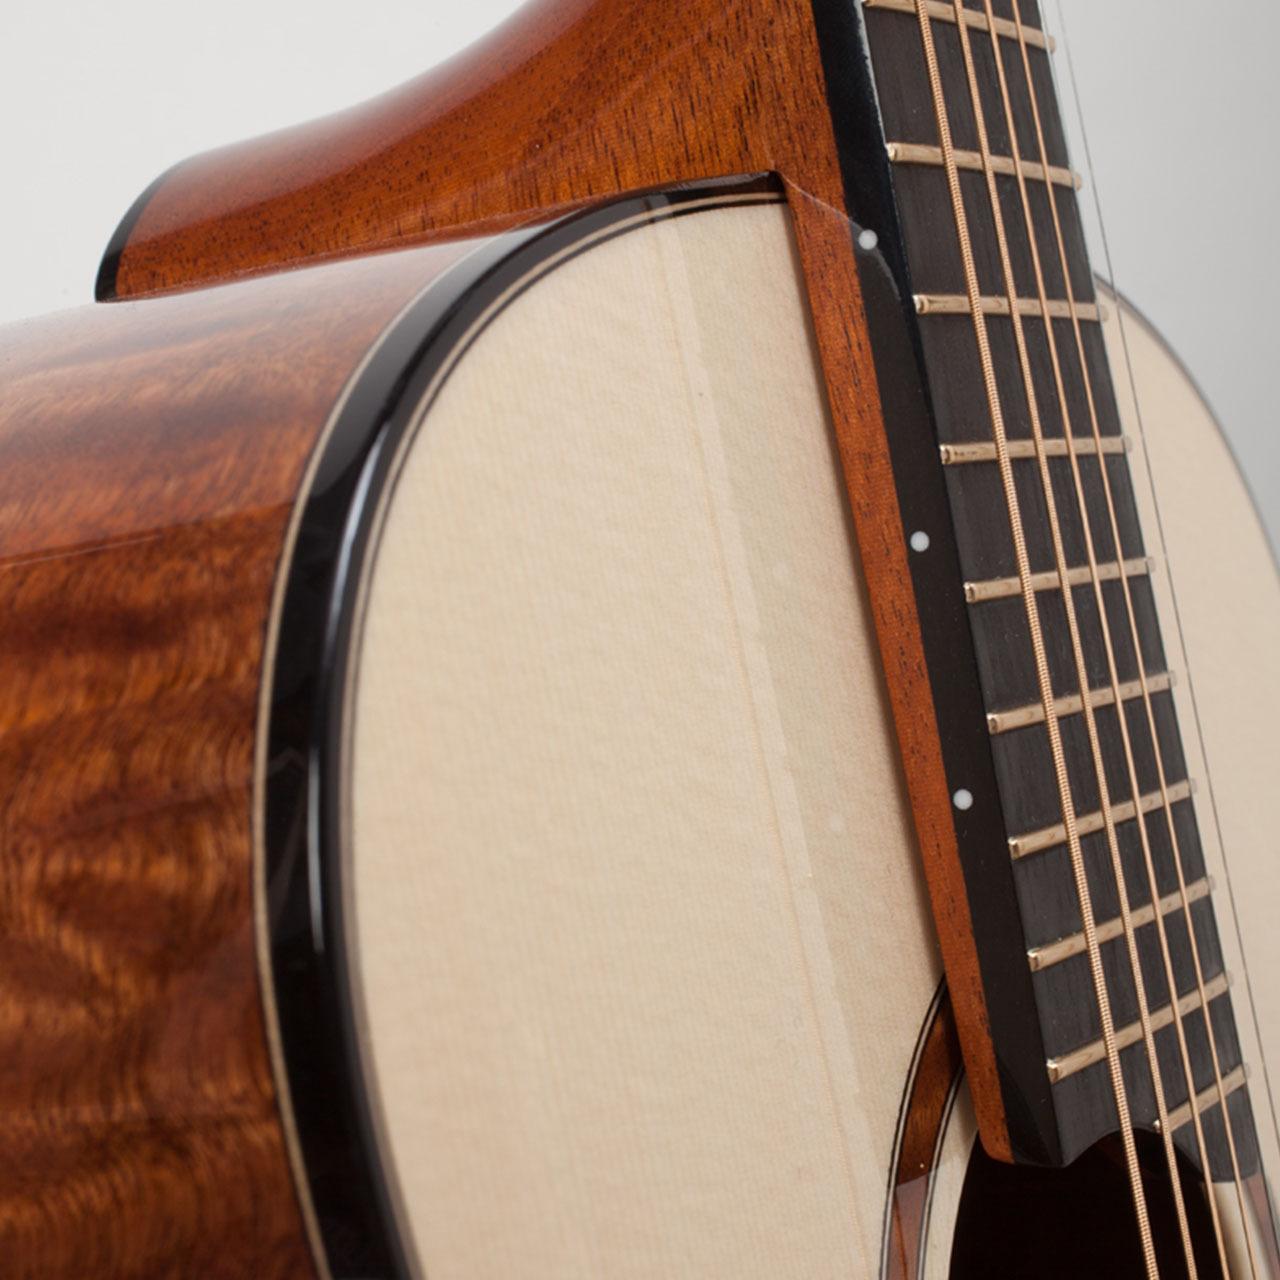 Guitar_6_4__55237.1445947031.1280.1280.jpg